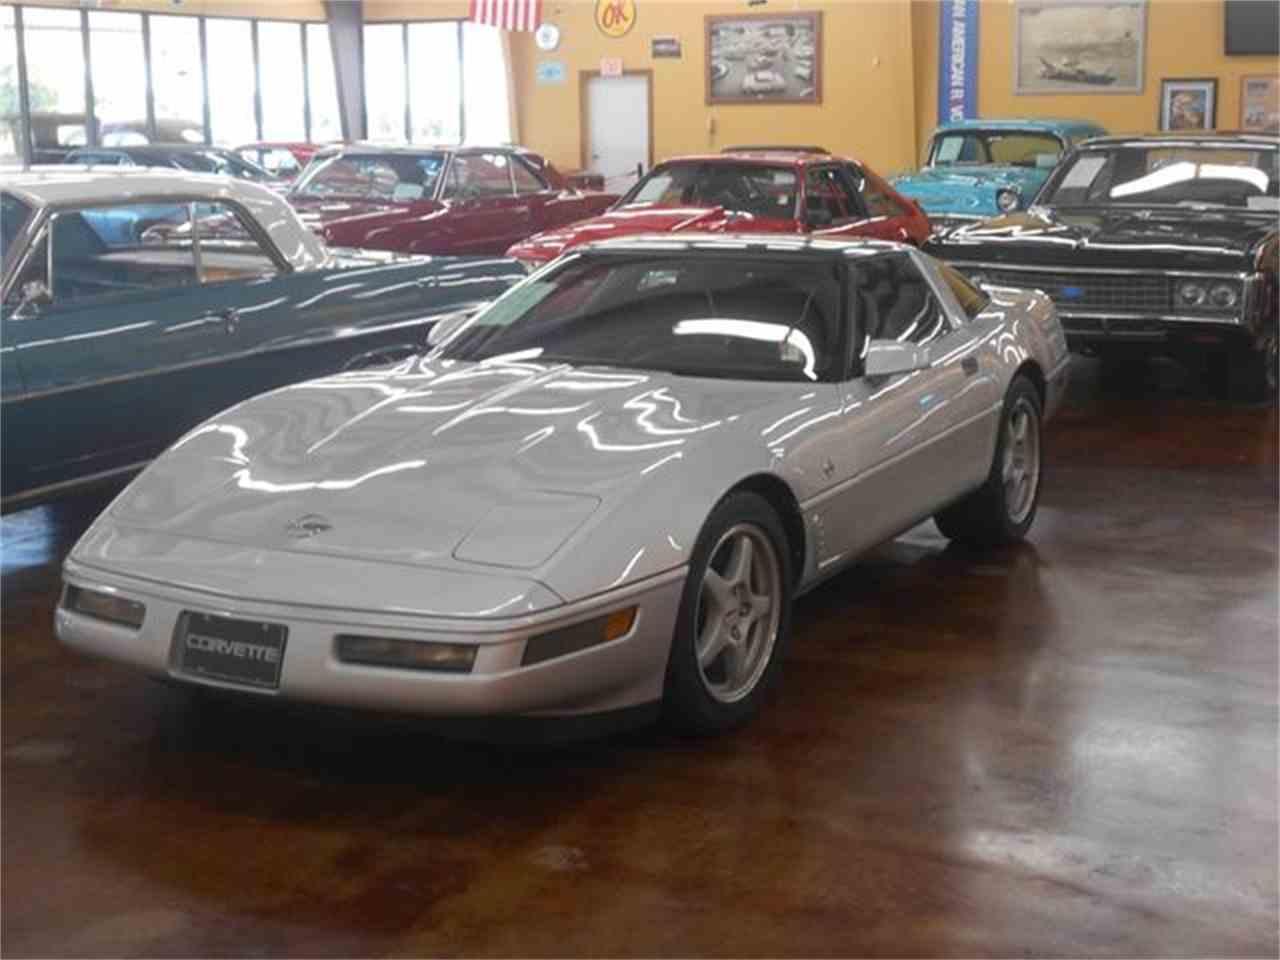 1996 Chevrolet Corvette for Sale - CC-1000736